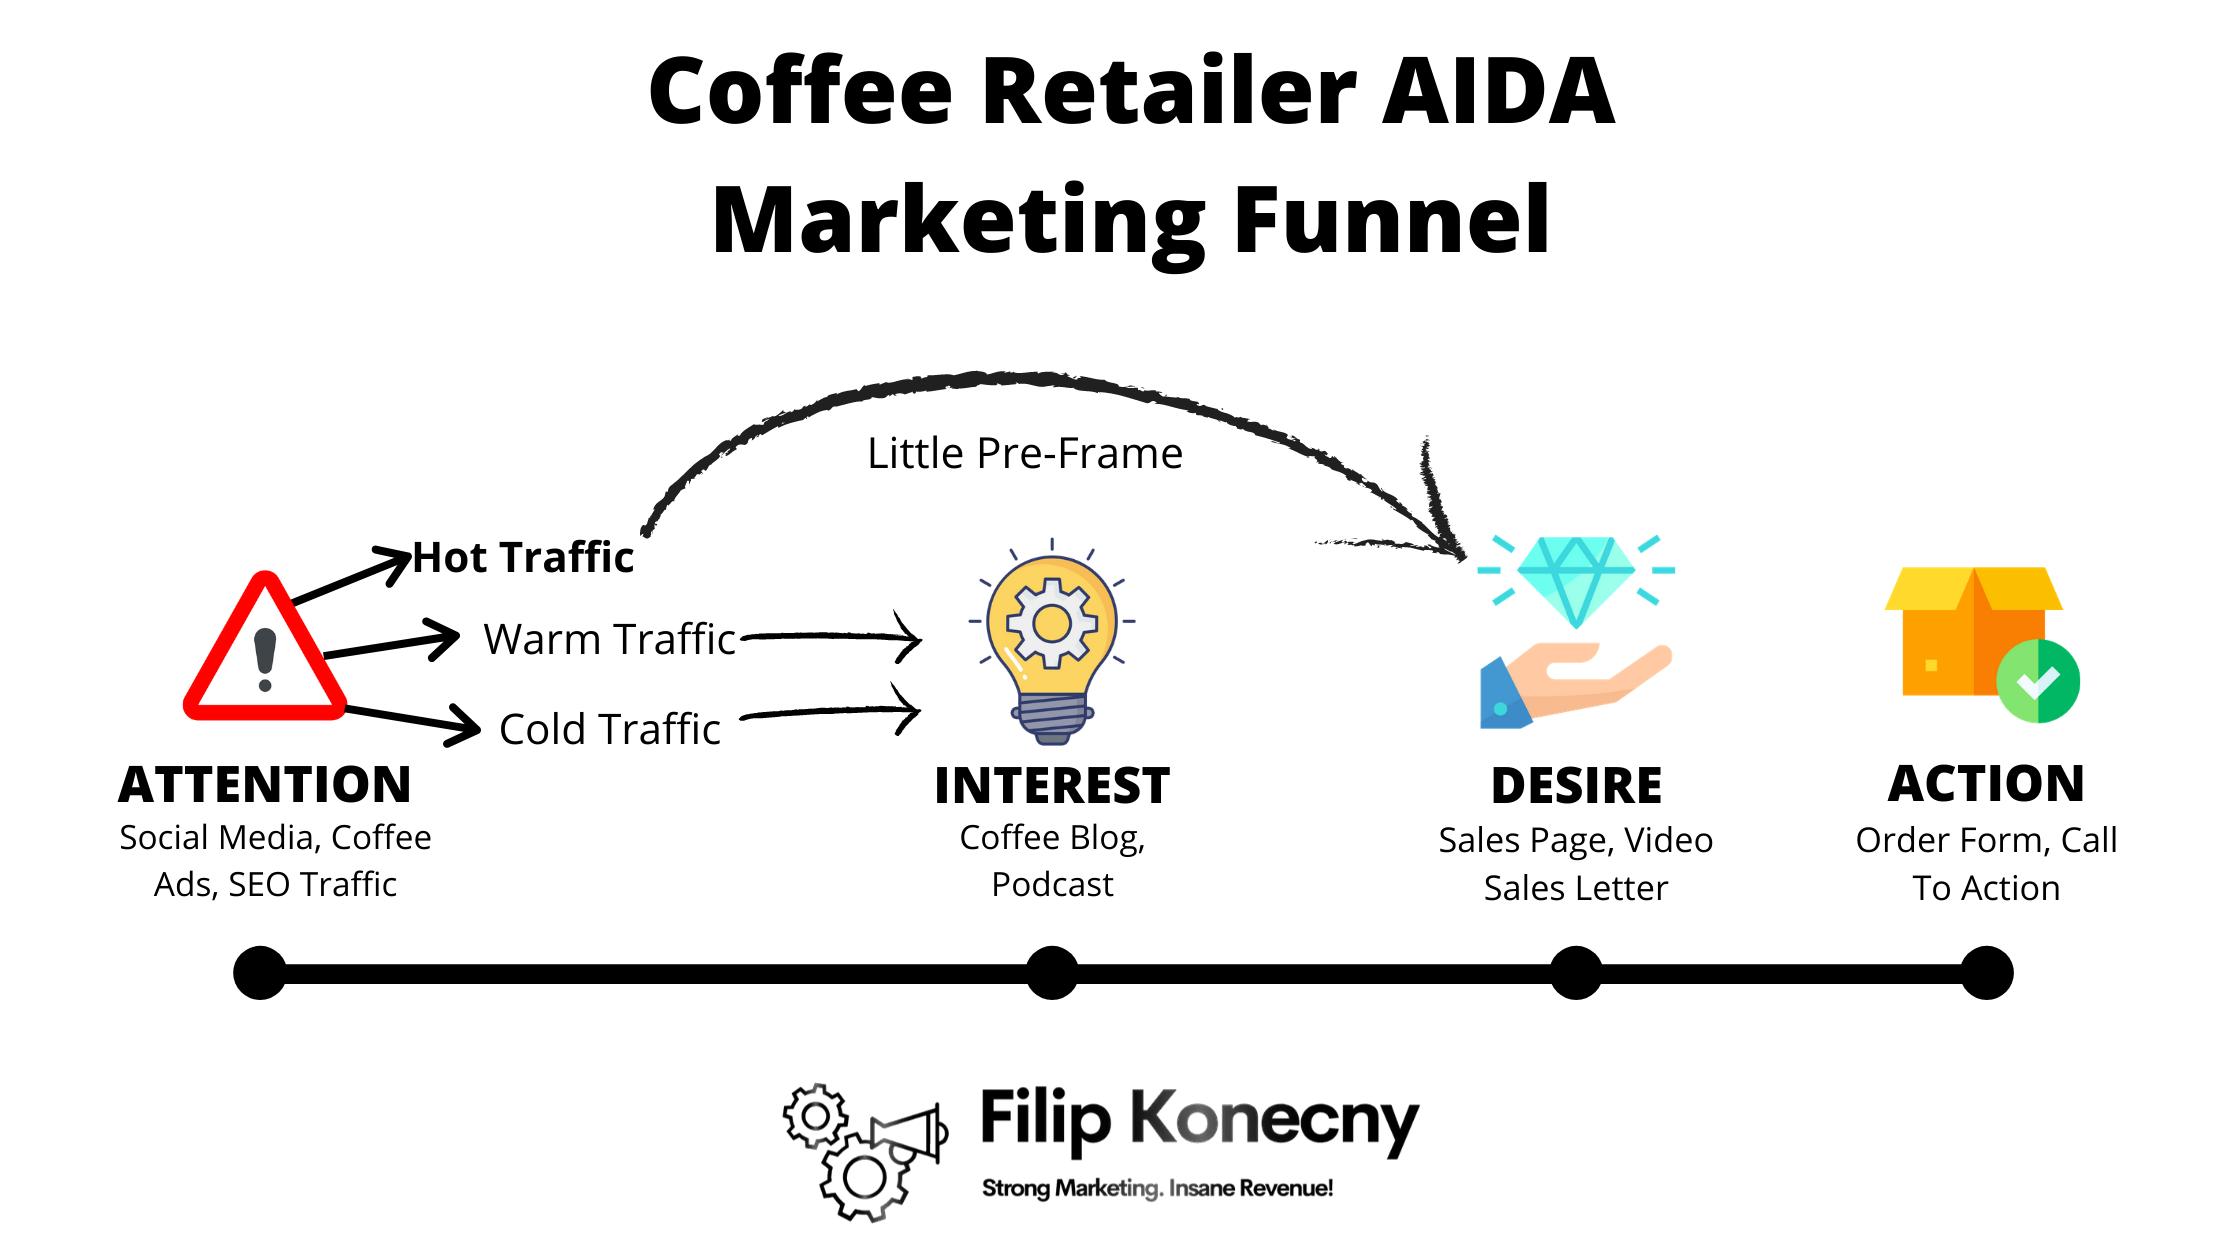 Aida marketing funnel example.